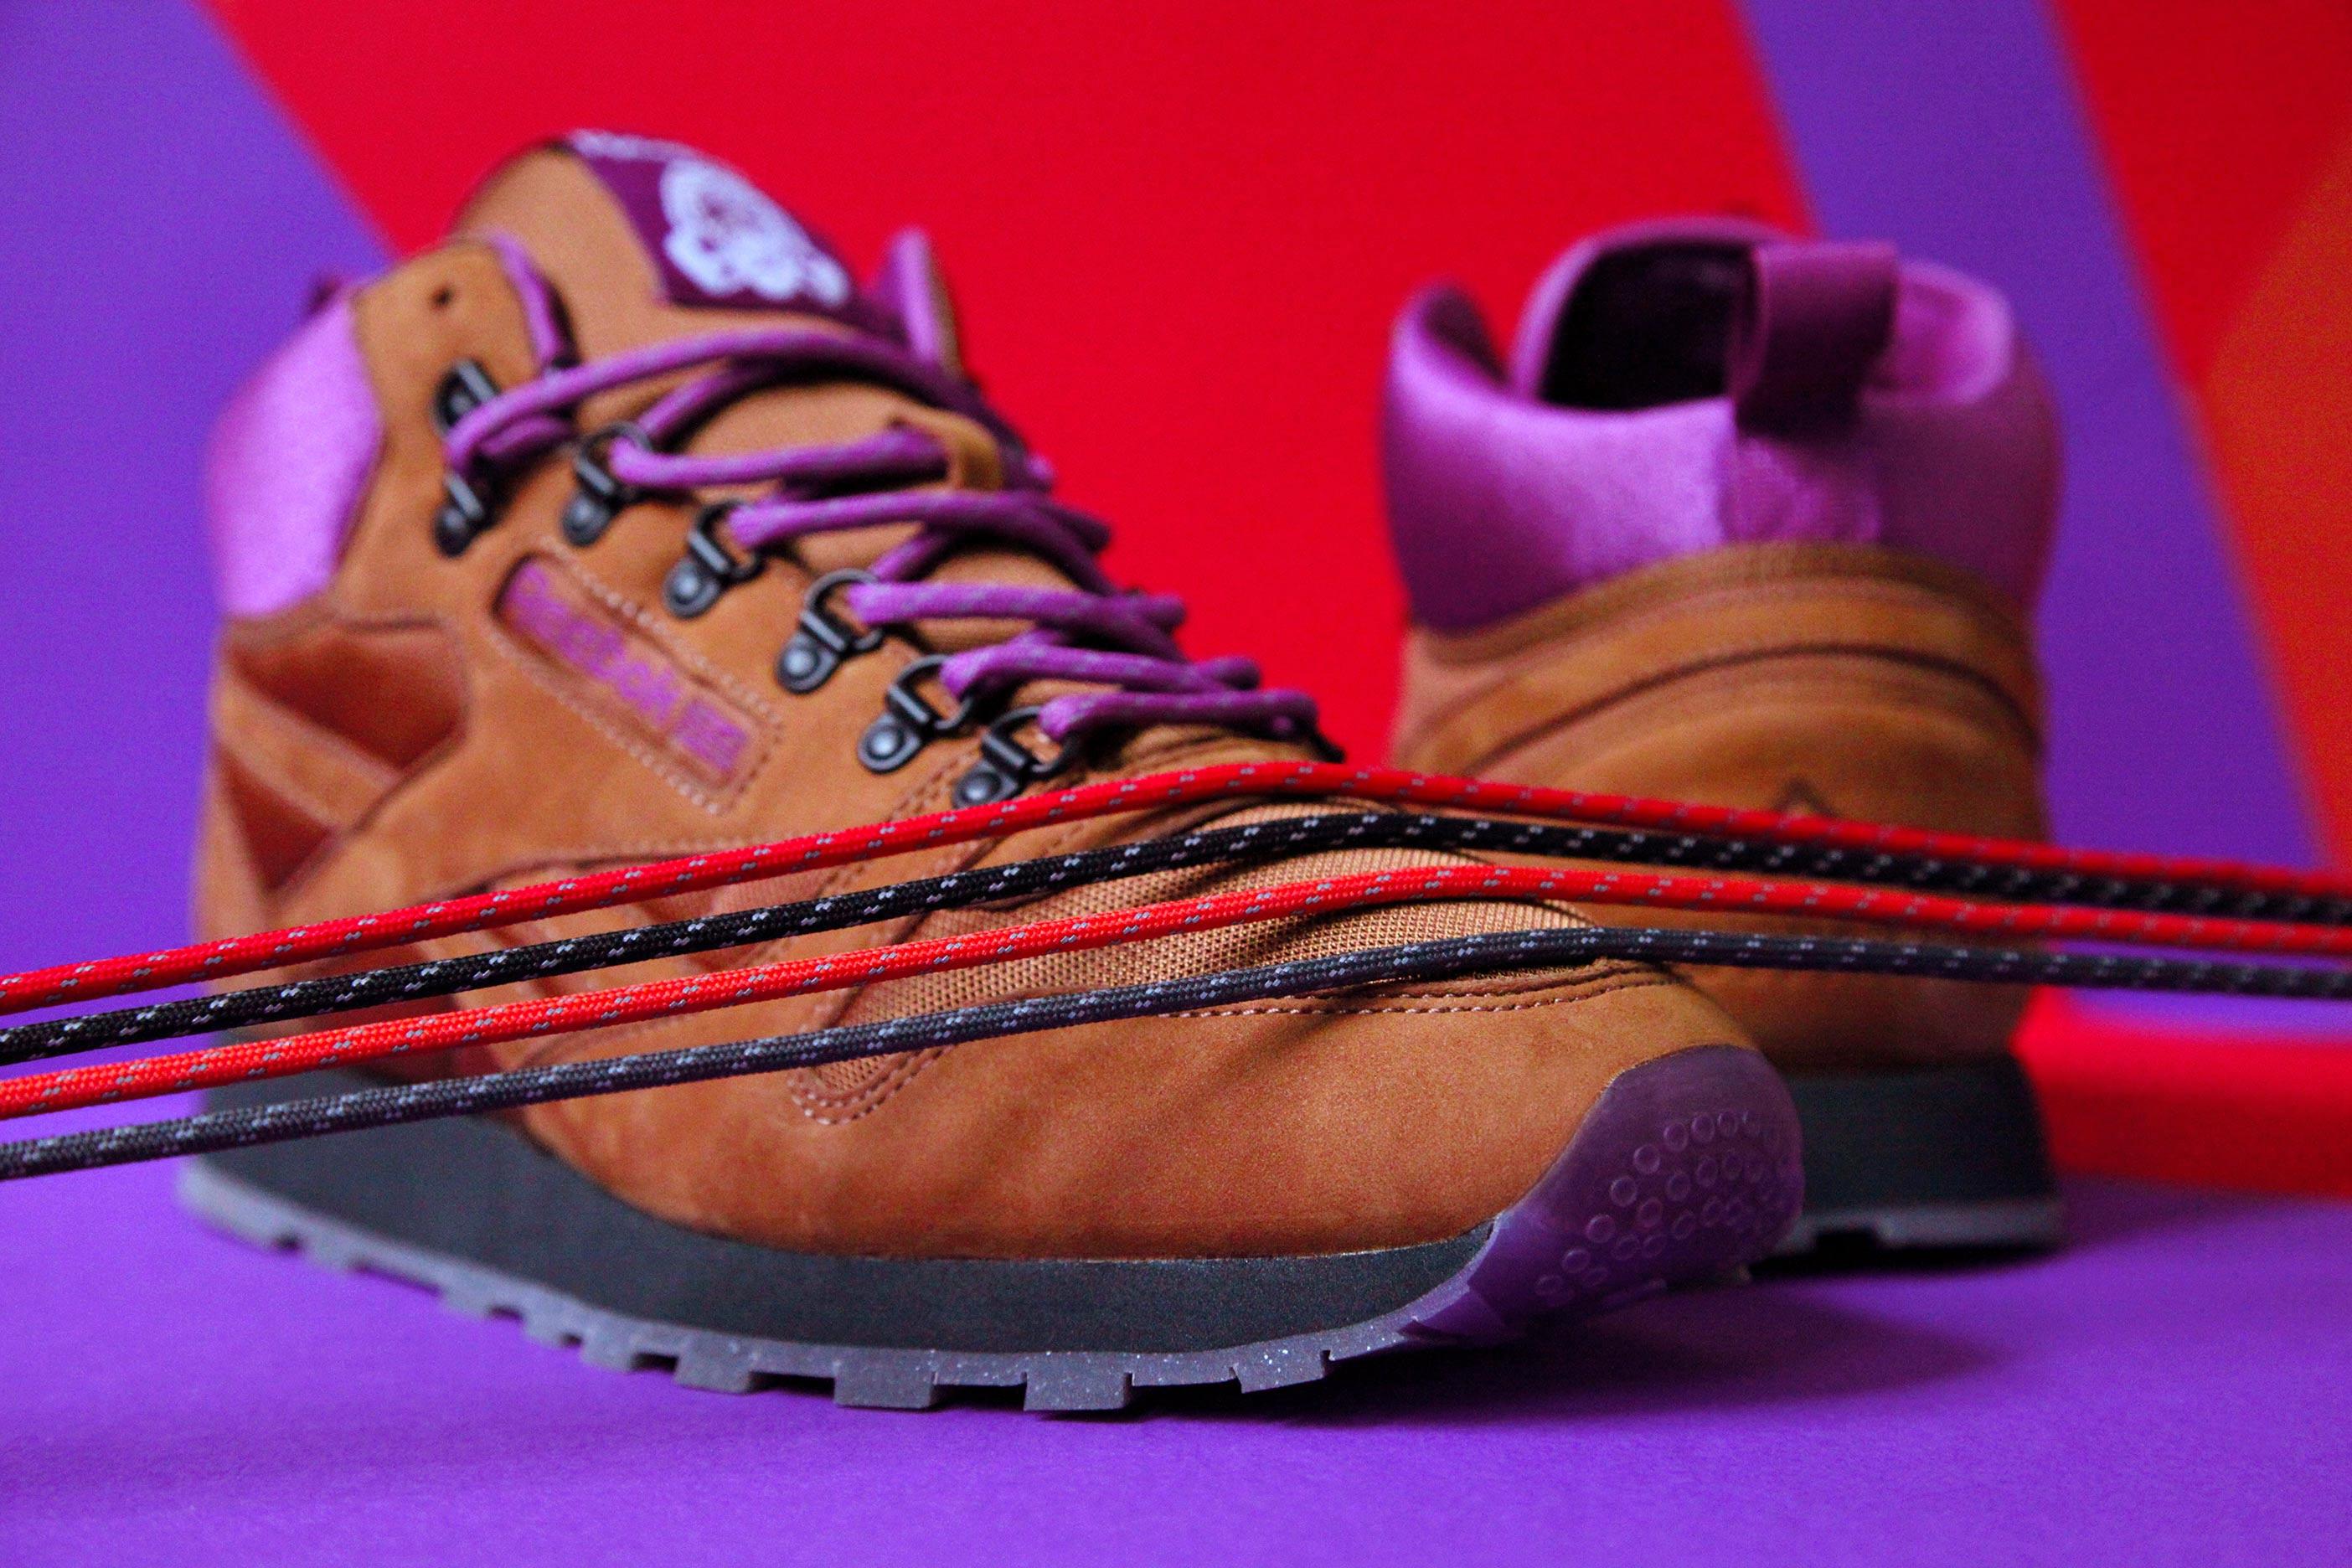 foot-patrol-reebok-classic-leather-mid-on-the-rocks-10